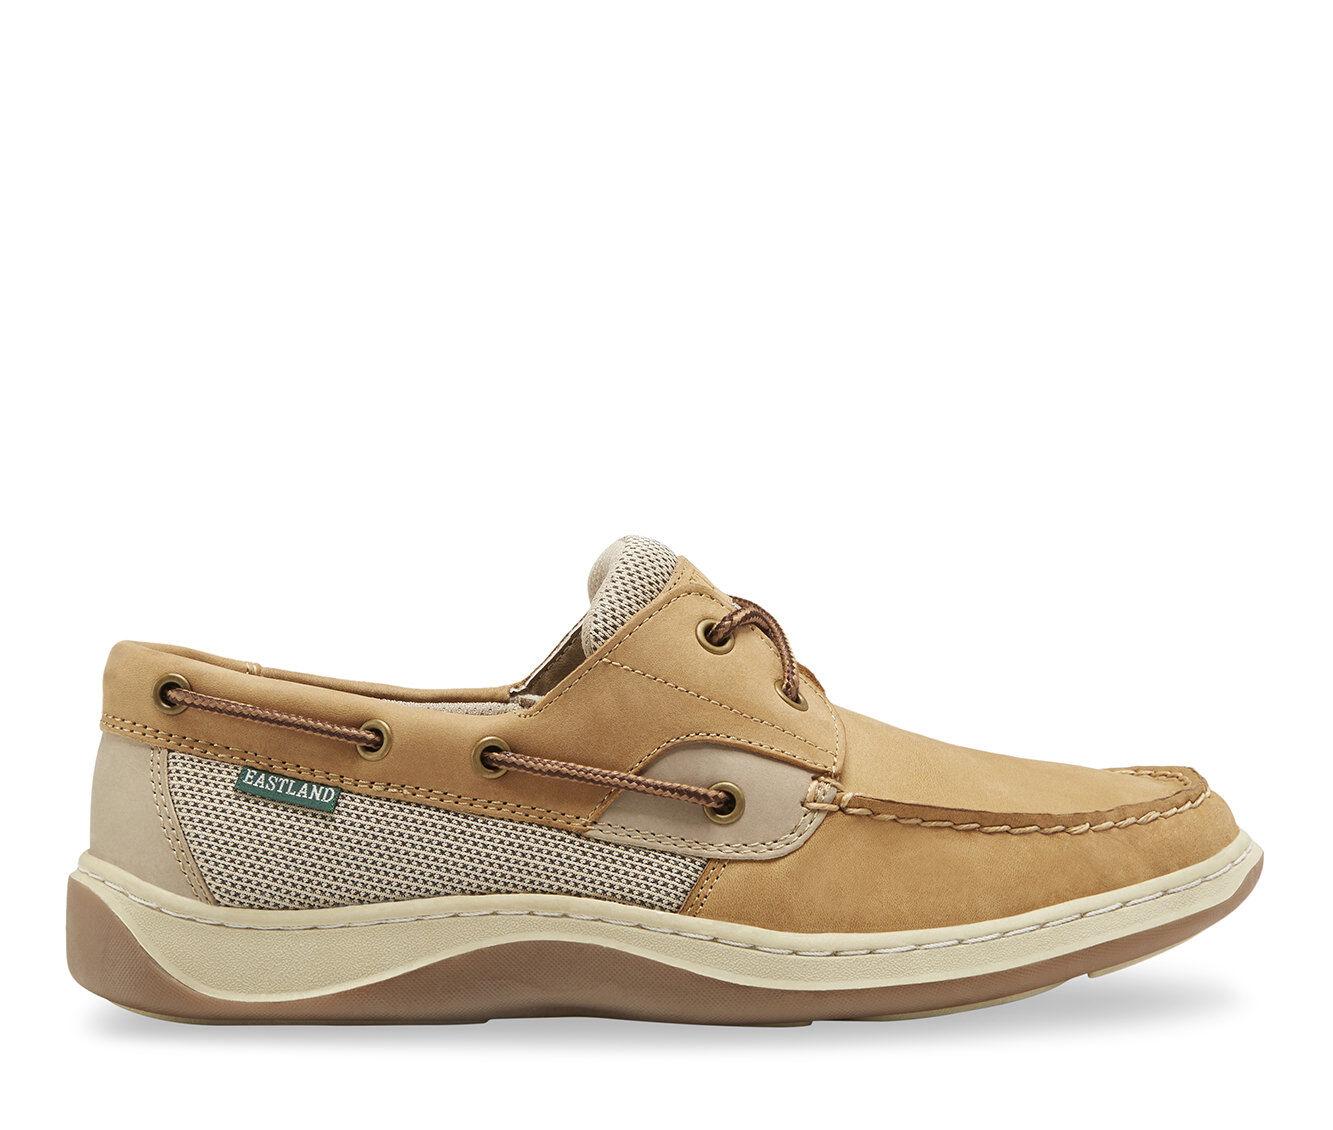 Men's Eastland Solstice Boat Shoes Tan